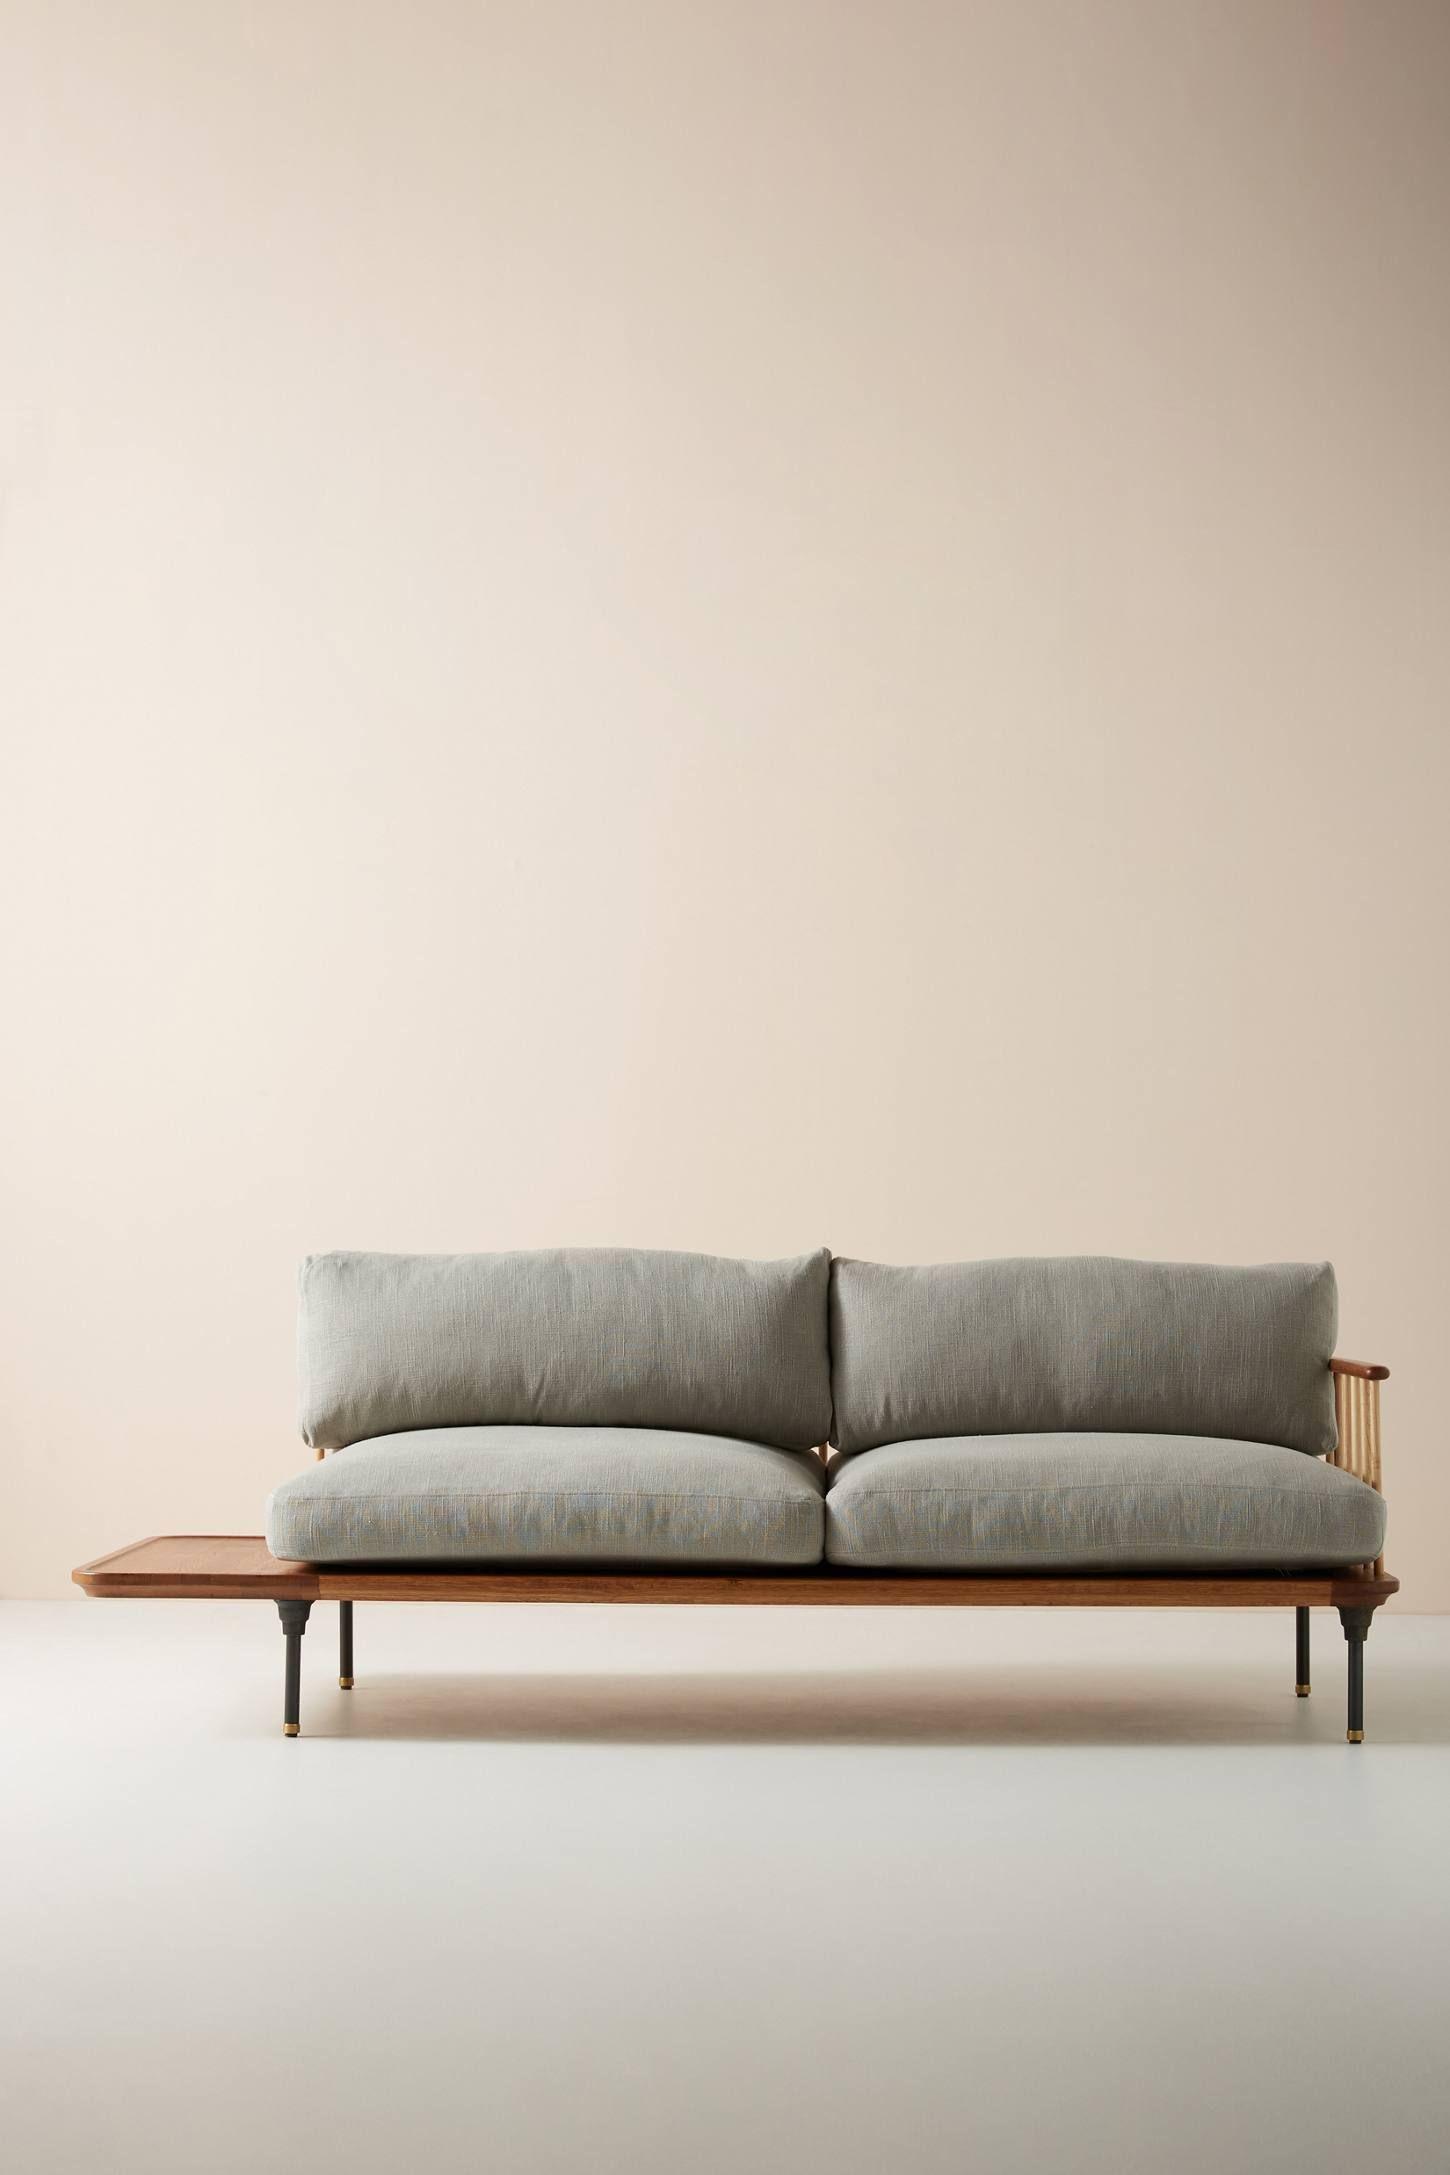 Incredible Kalmar Sofa With Side Table In 2019 Referensi Ta Sofa Beatyapartments Chair Design Images Beatyapartmentscom